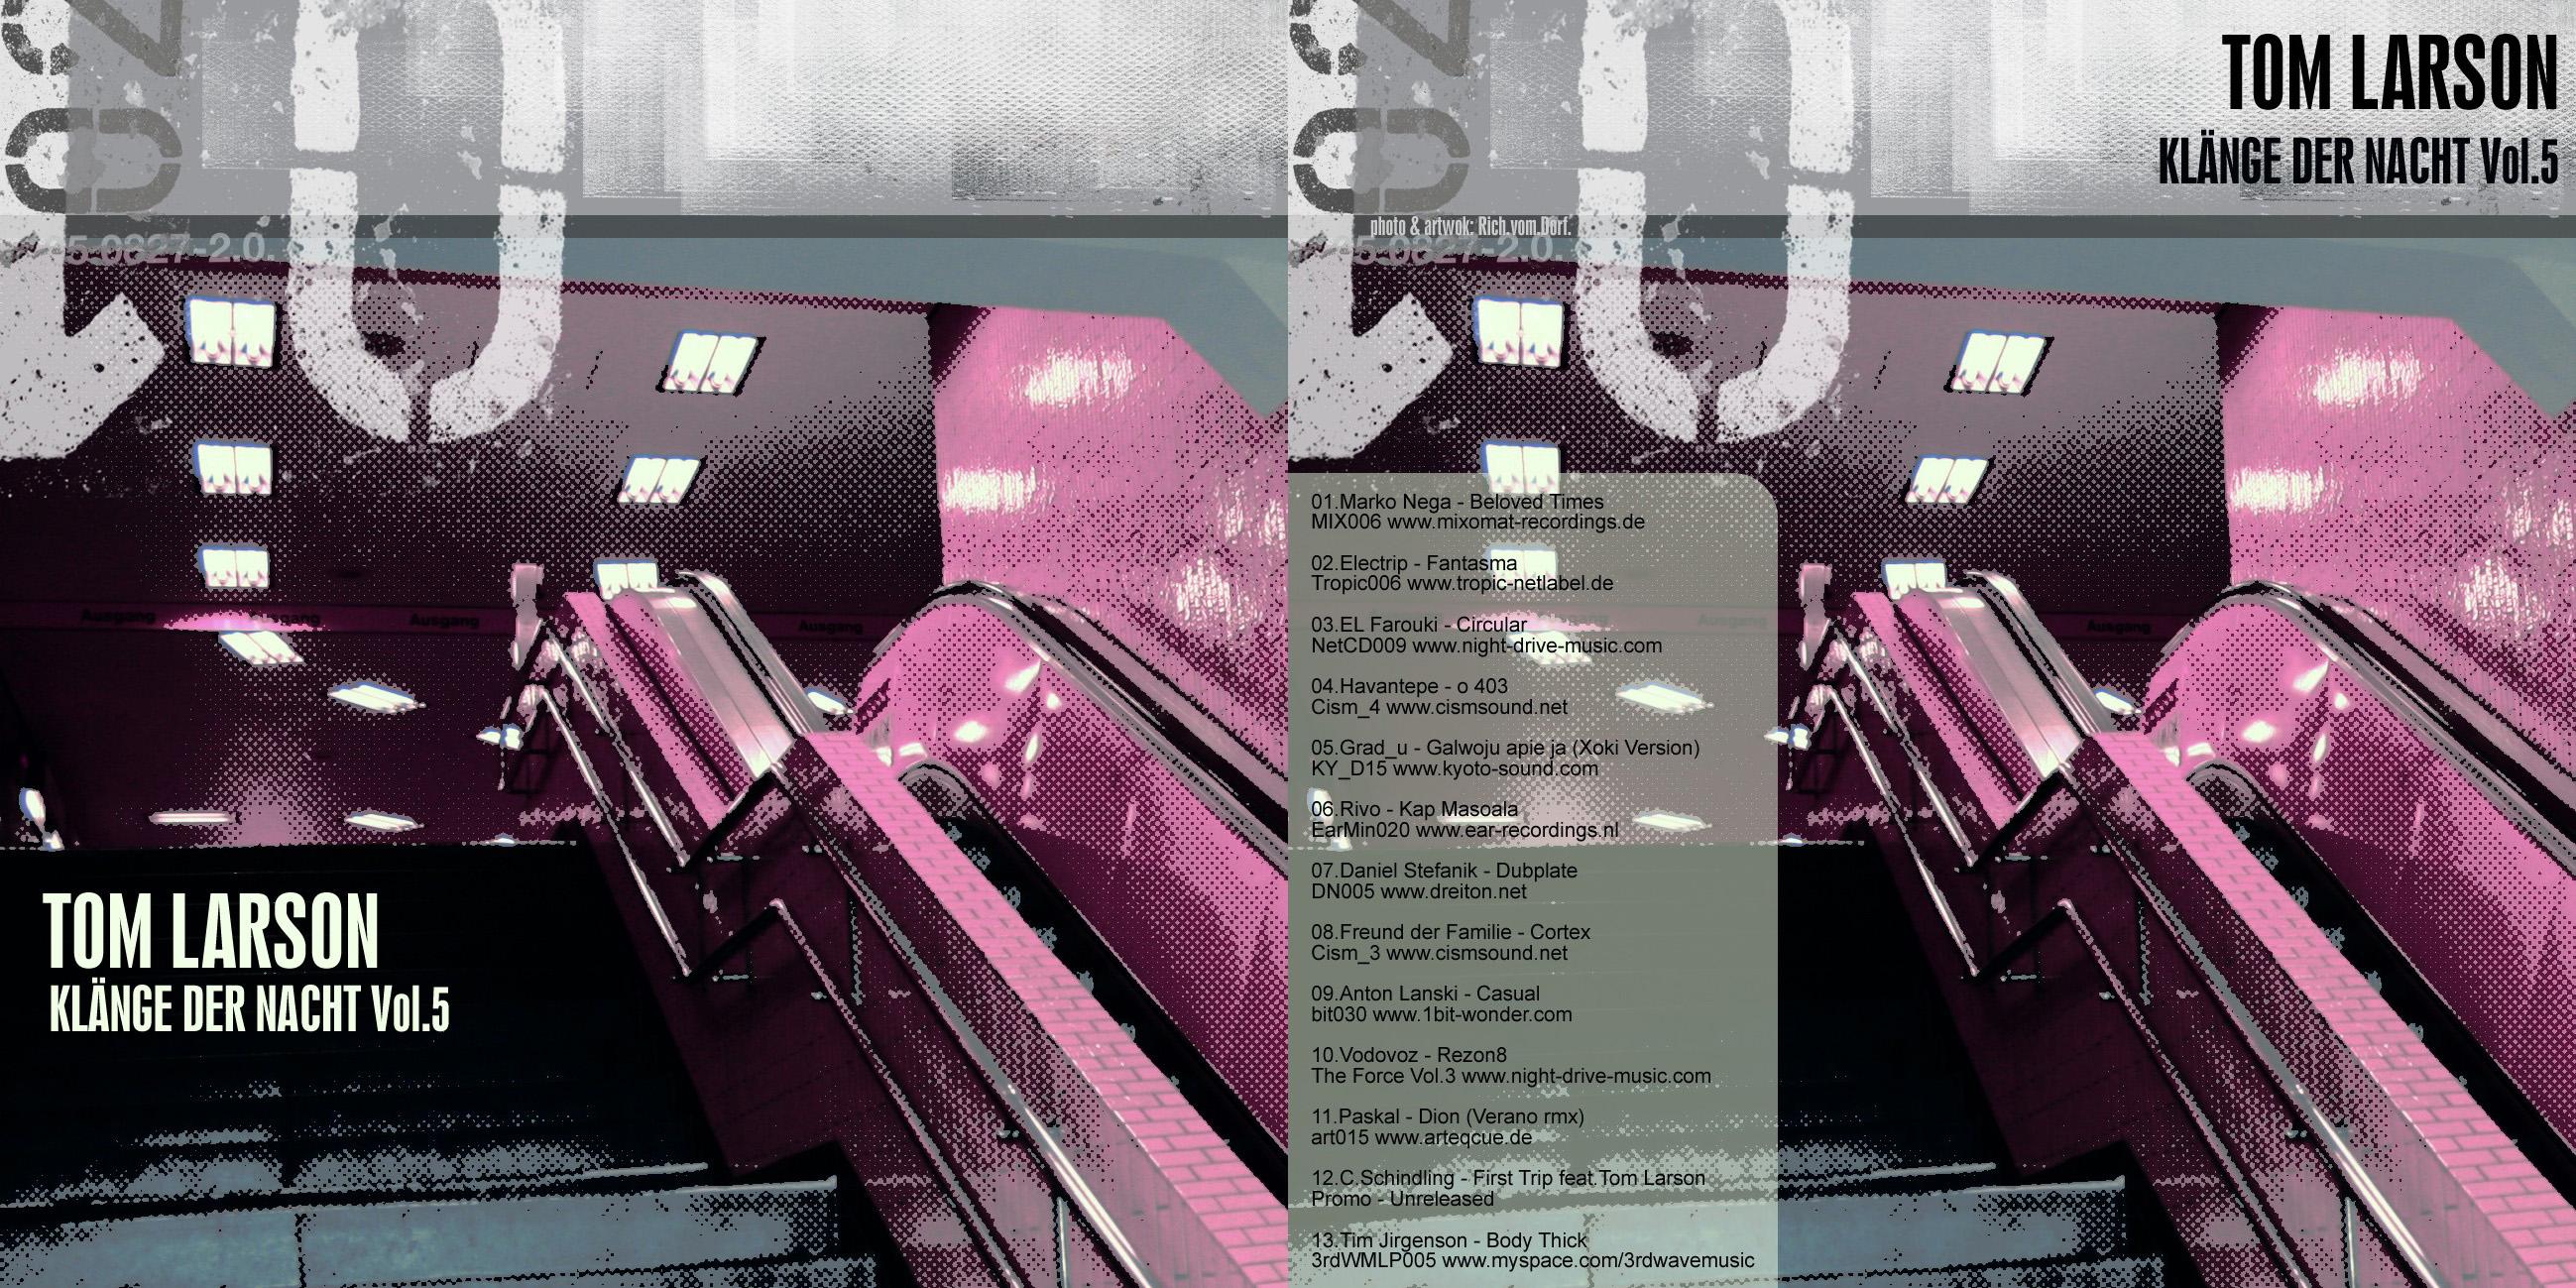 http://www.mixotic.net/mixes/135_-_Tom_Larson_-_Klaenge_der_Nacht_Vol_5/cover_large.jpg